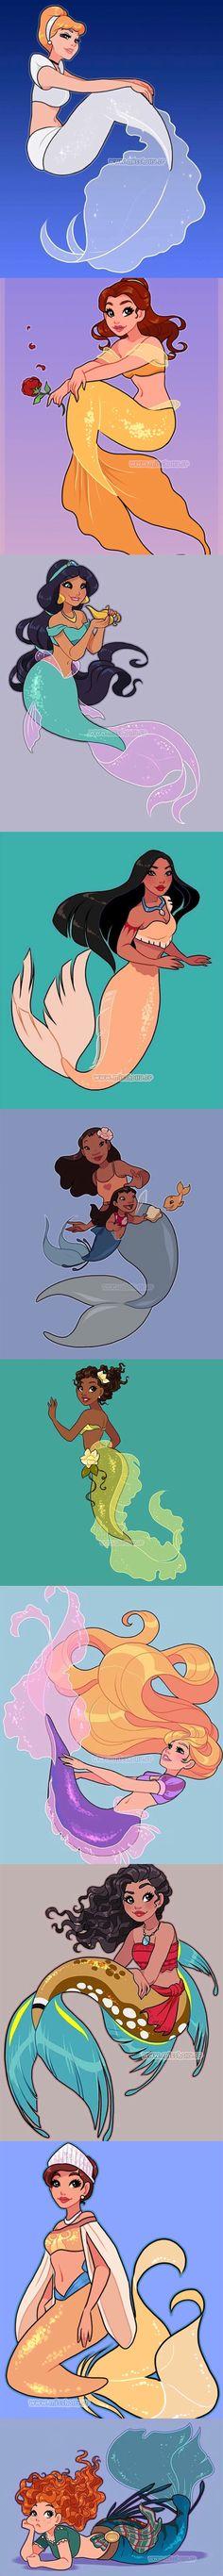 Trendy Drawing Disney Pixar The Princess Disney Pixar, Ariel Disney, Disney Marvel, Disney Animation, Disney Jokes, Funny Disney Memes, Mermaid Disney, Disney Facts, Disney Girls